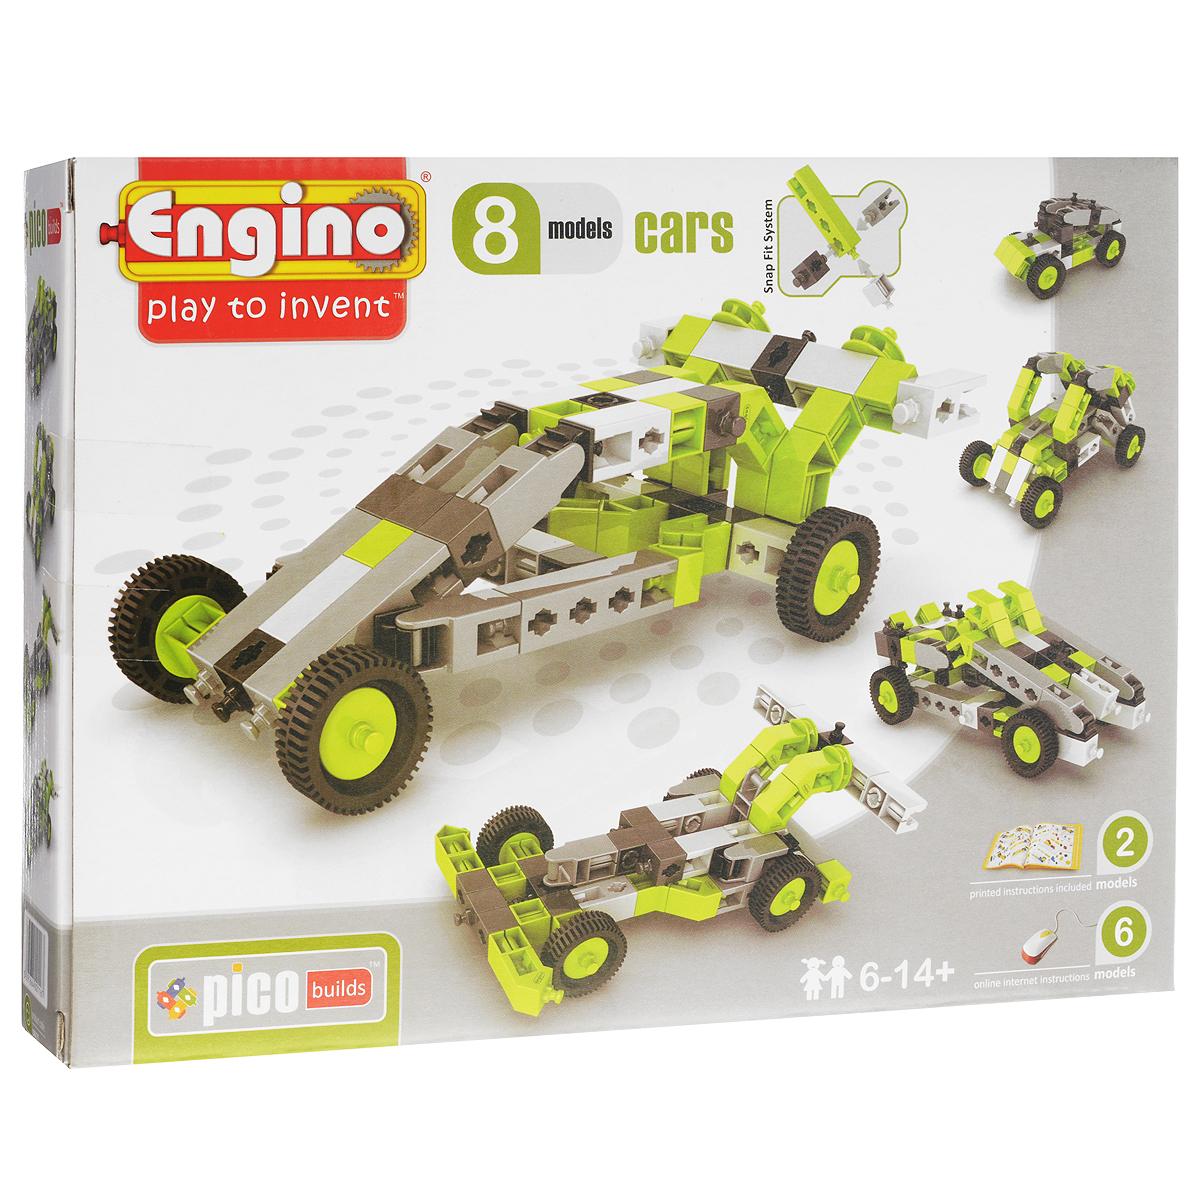 Конструктор Engino Cars, 69 элементов конструктор engino cars 69 элементов